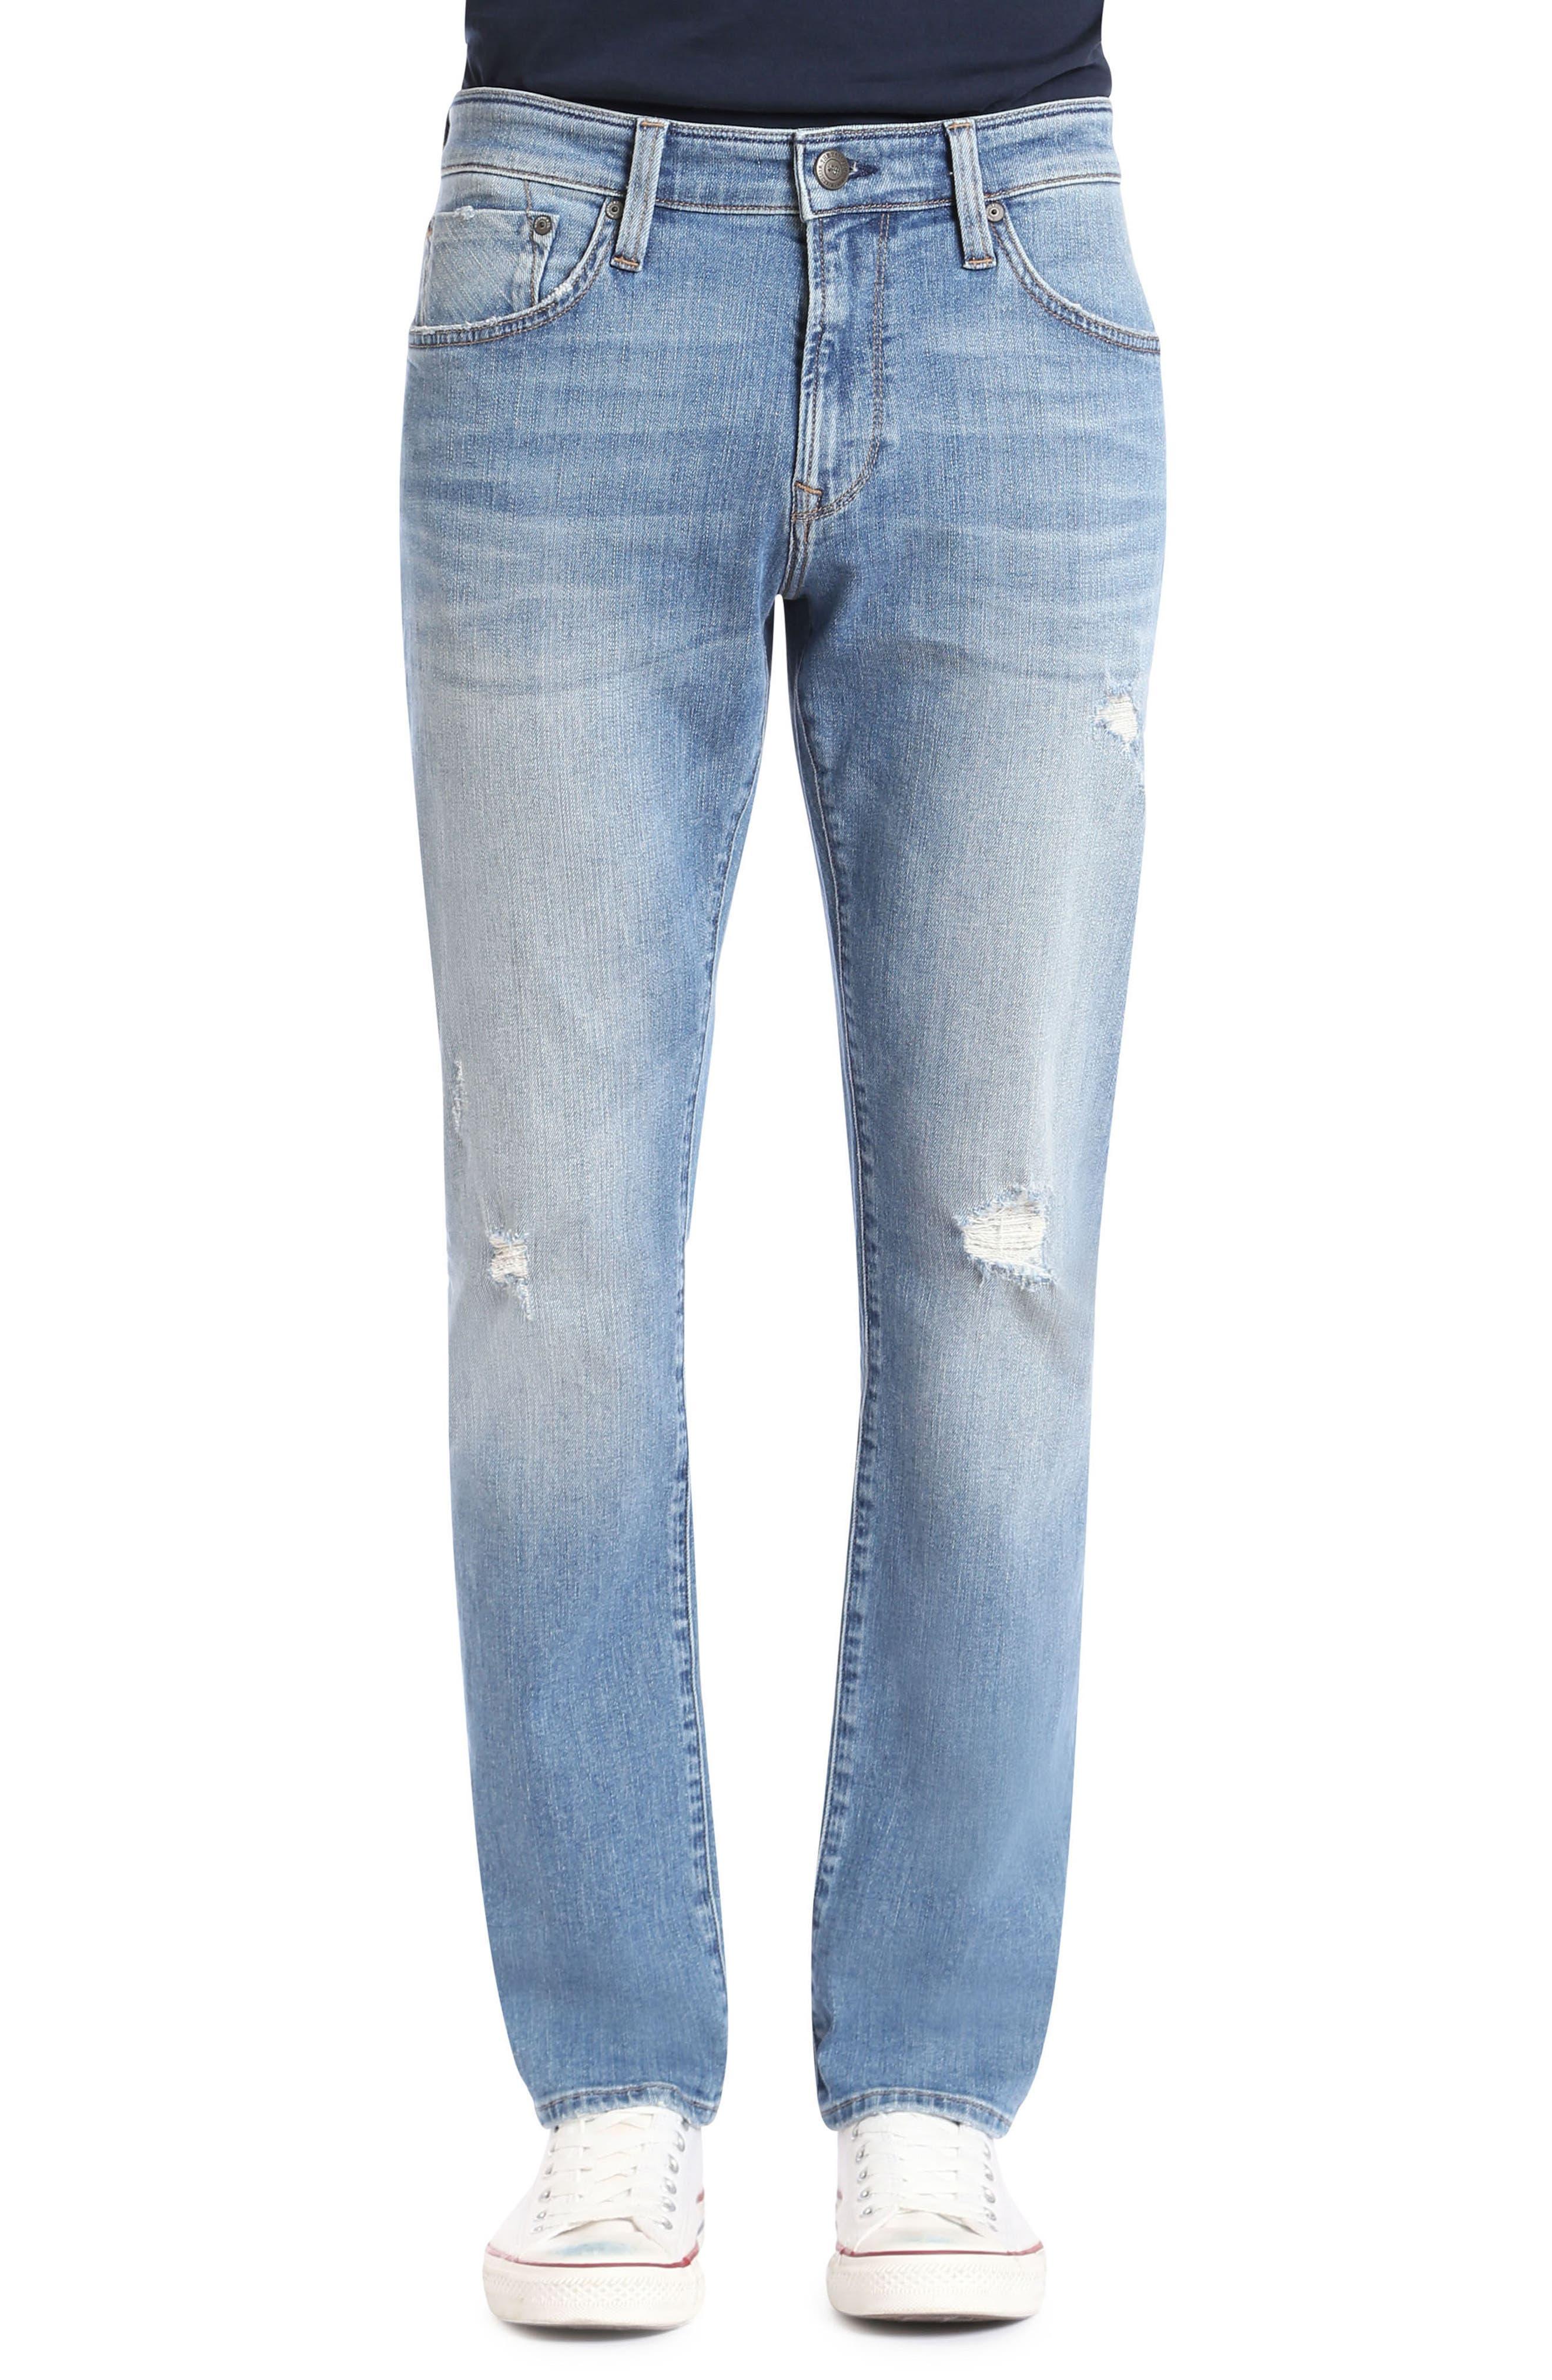 Marcus Slim Straight Leg Jeans,                         Main,                         color, Light Used Authentic Vintage